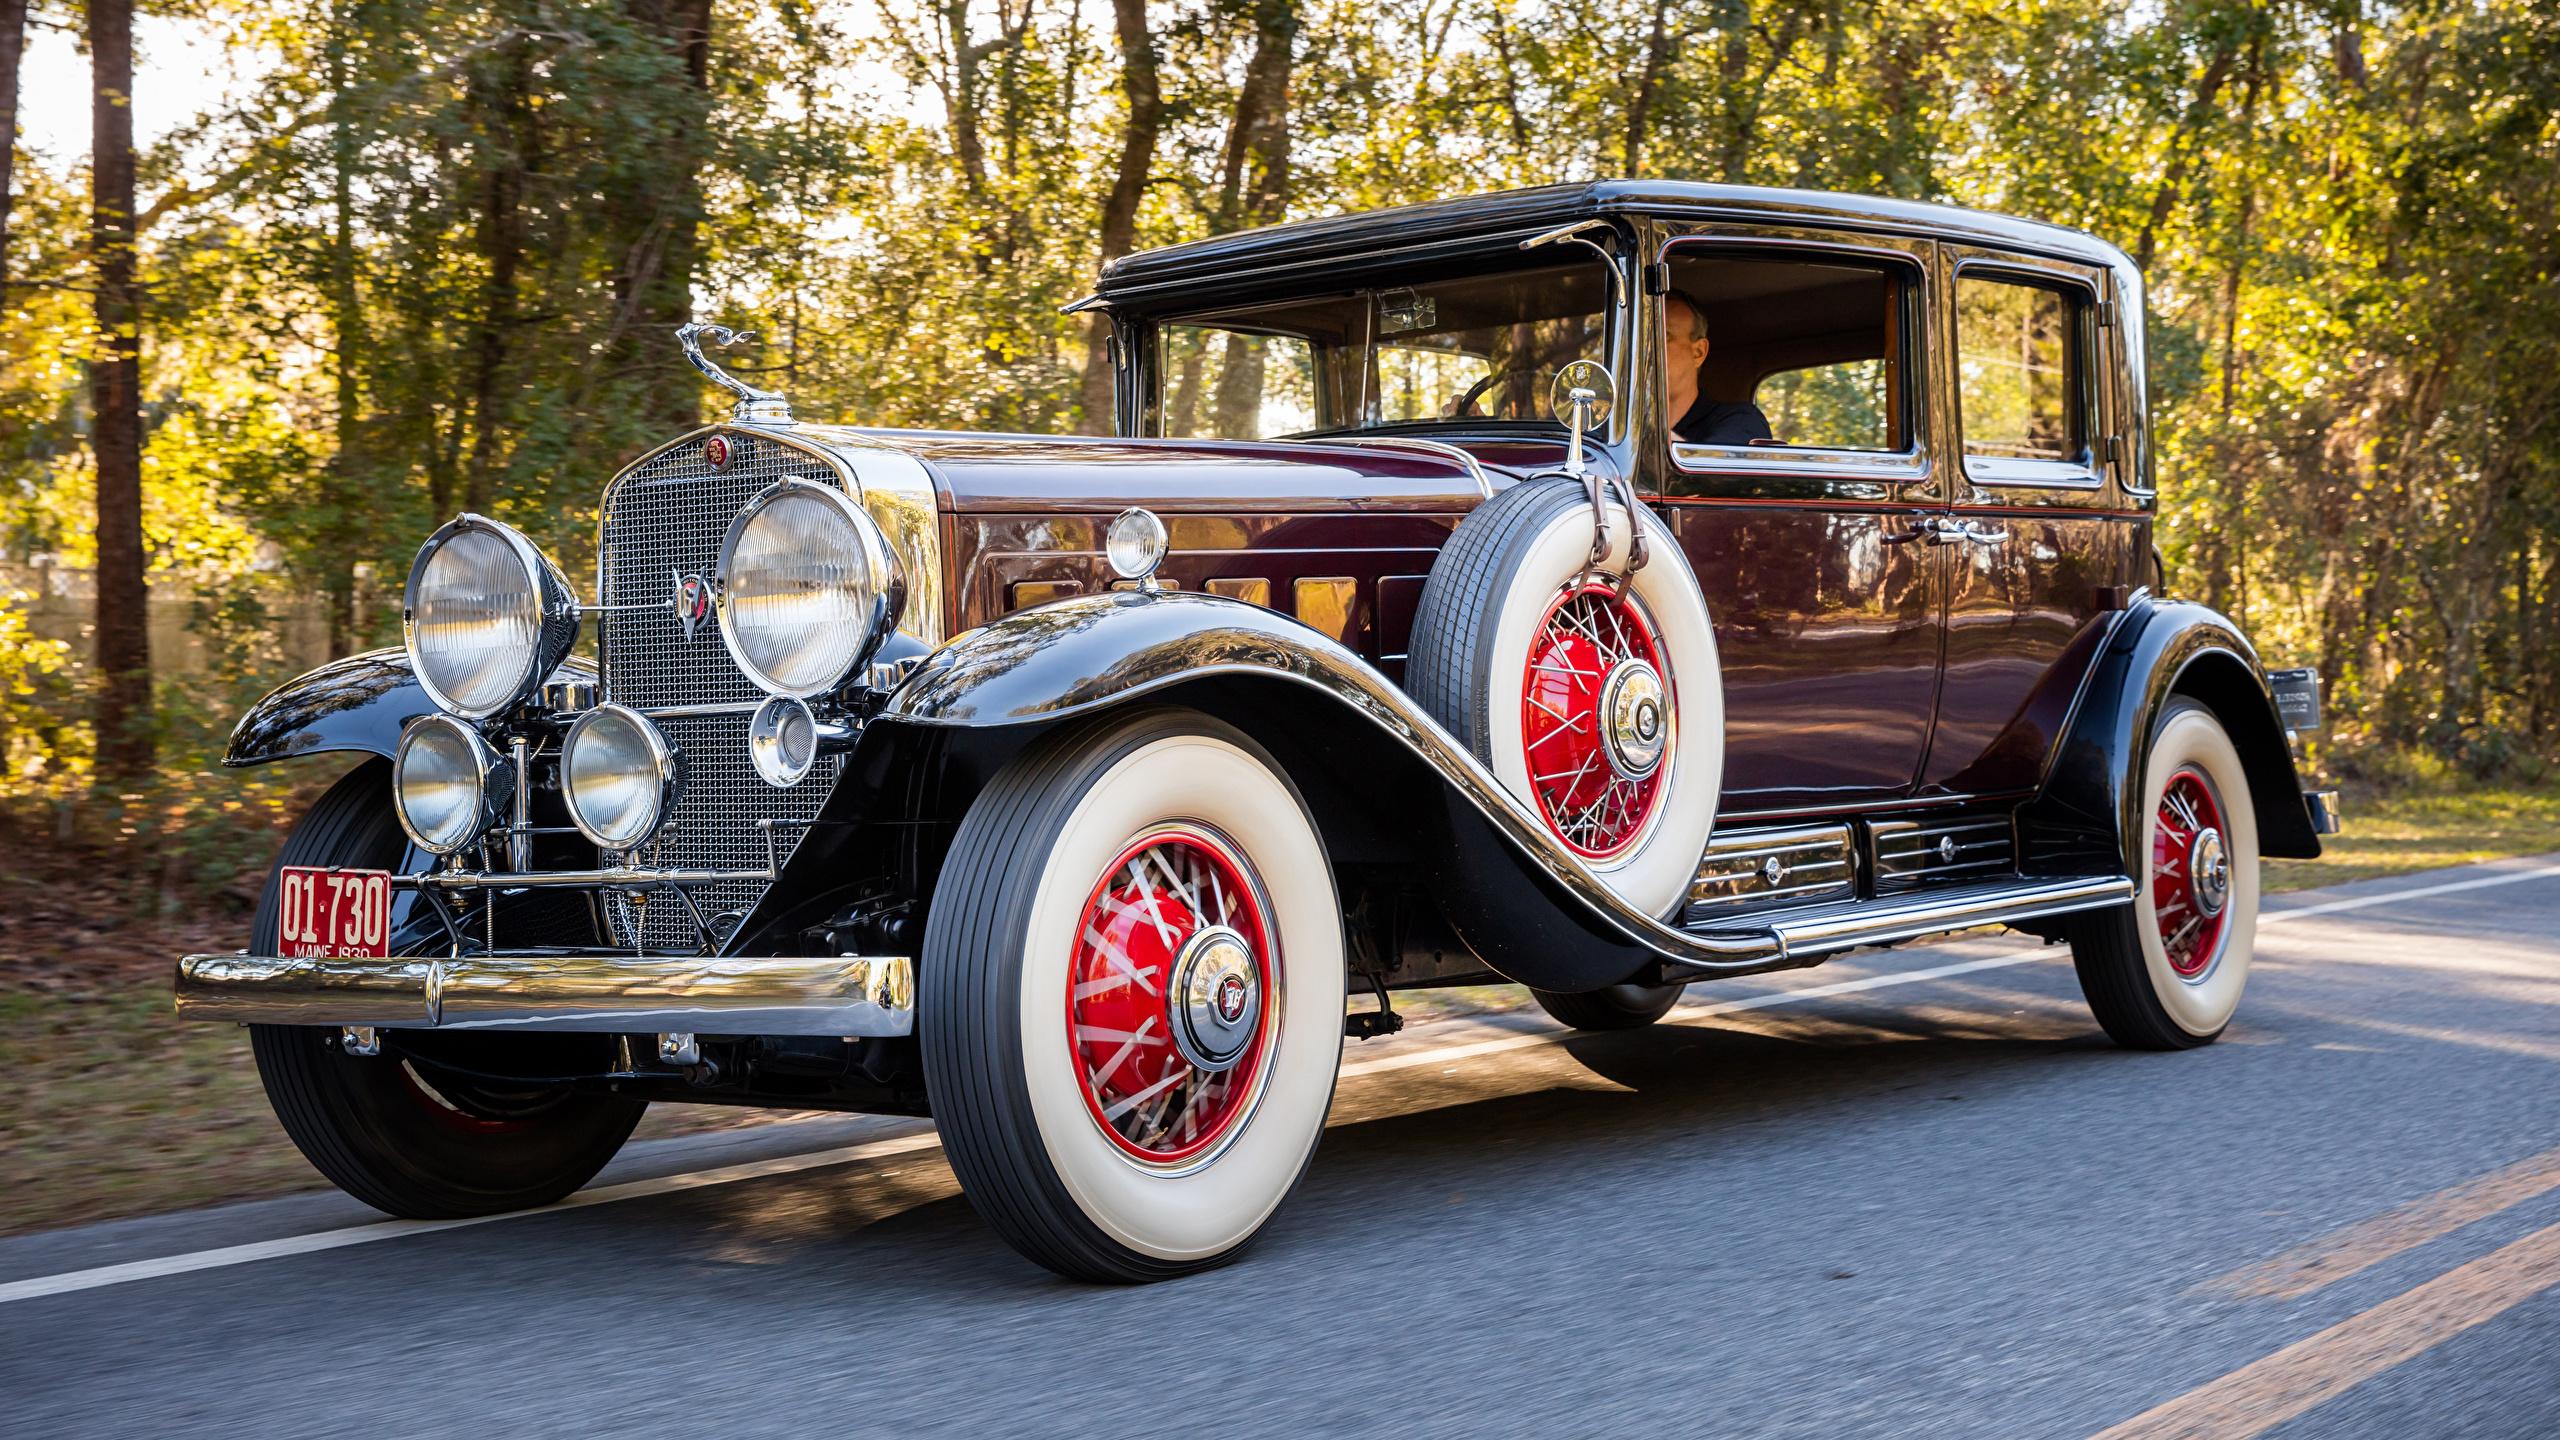 Photo Cadillac 1930 V16 452 Club Sedan By Fleetwood Retro 2560x1440